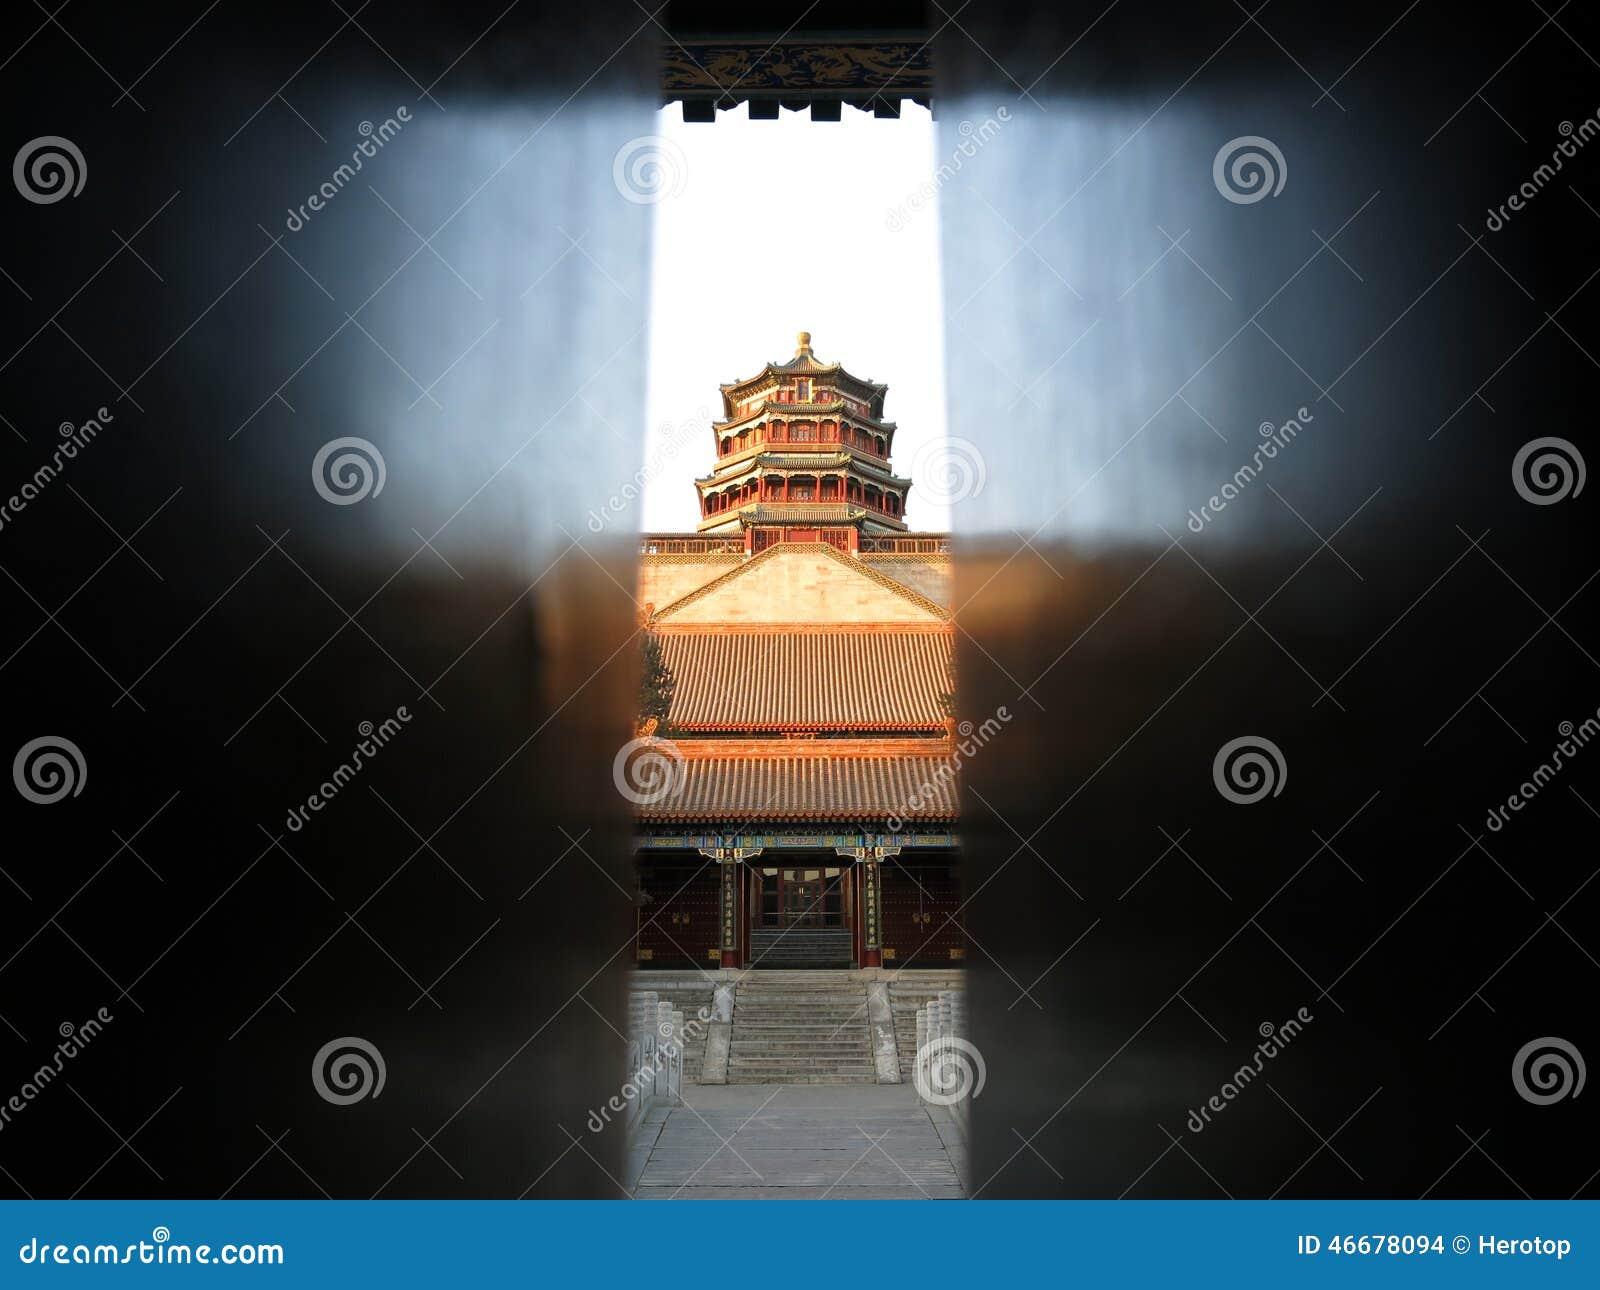 Pass Through Stock Photo Image 46678094